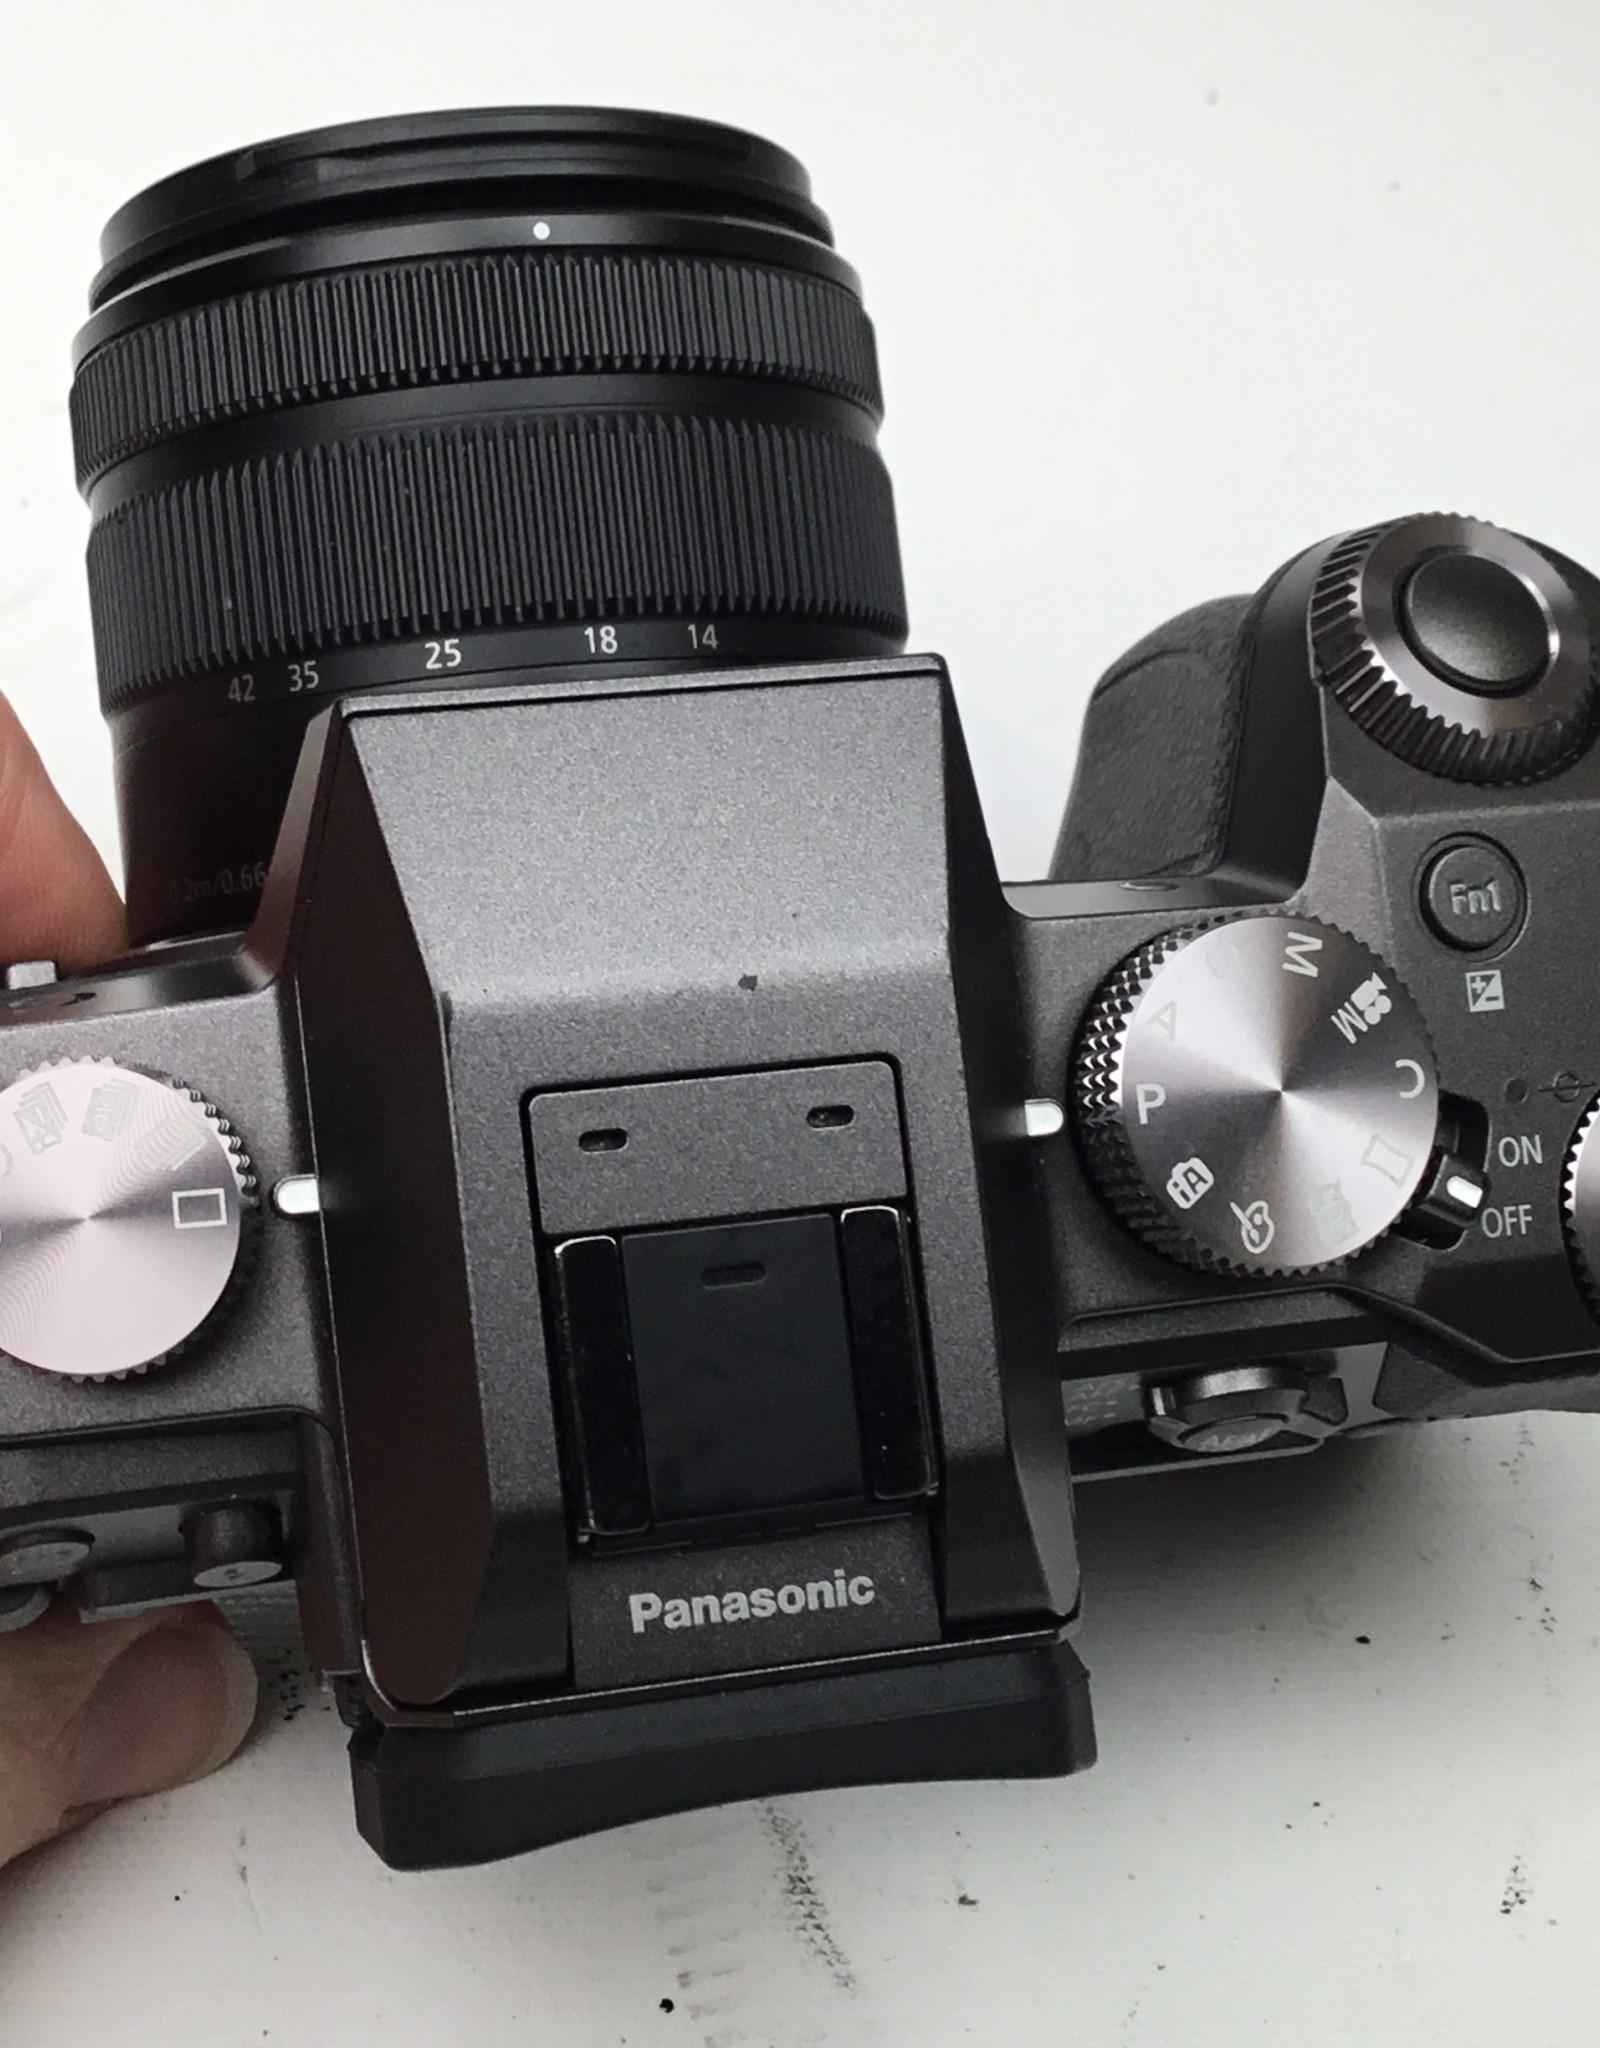 PANASONIC Panasonic DMC-G7 Camera (No Charger) w/ 14-42mm Used Good